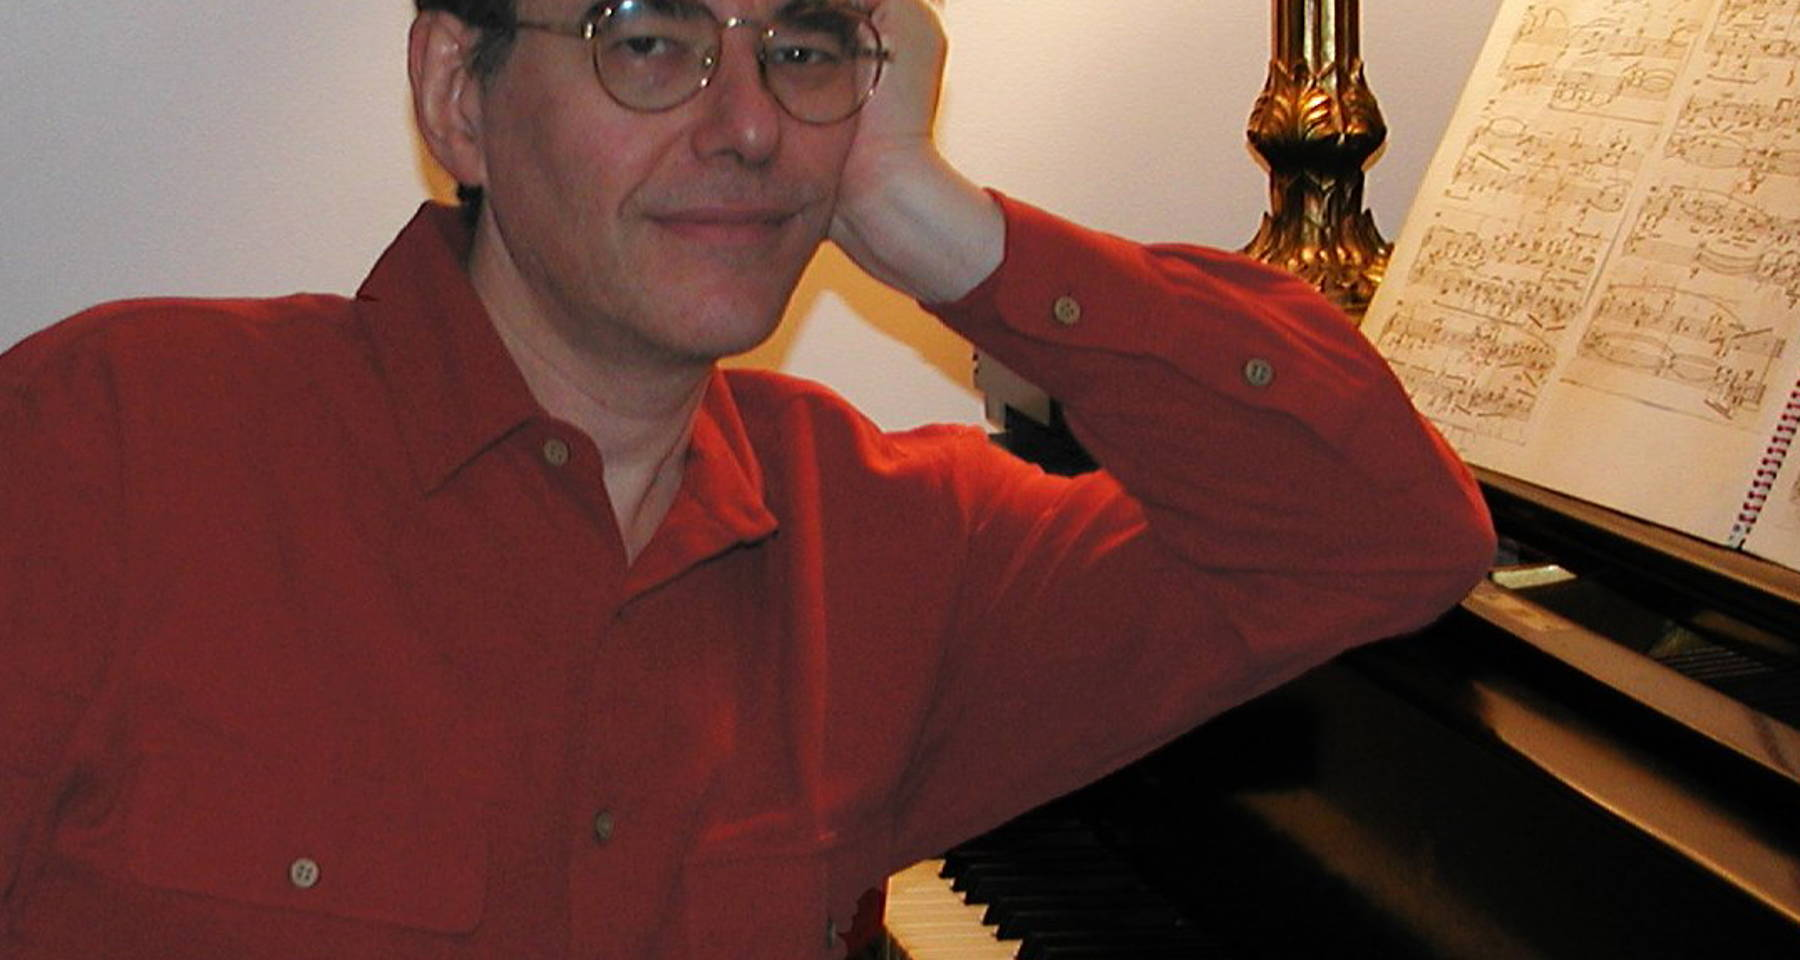 ASMI Presents: Pianist Marvin Wolfthal